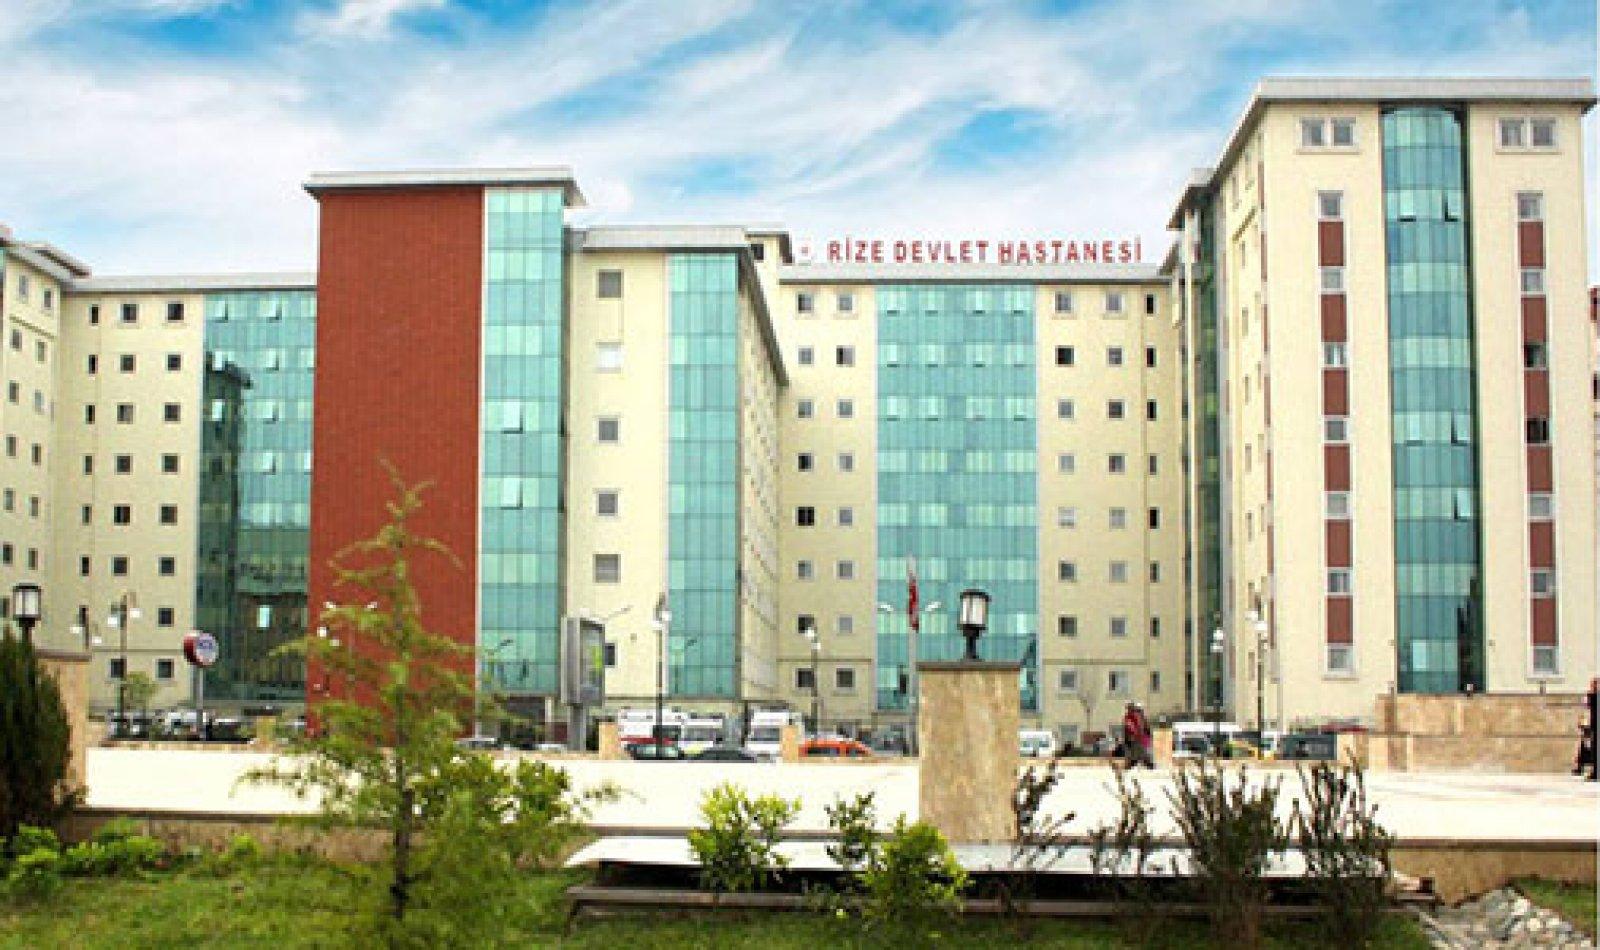 Rize Devlet Hastanesi